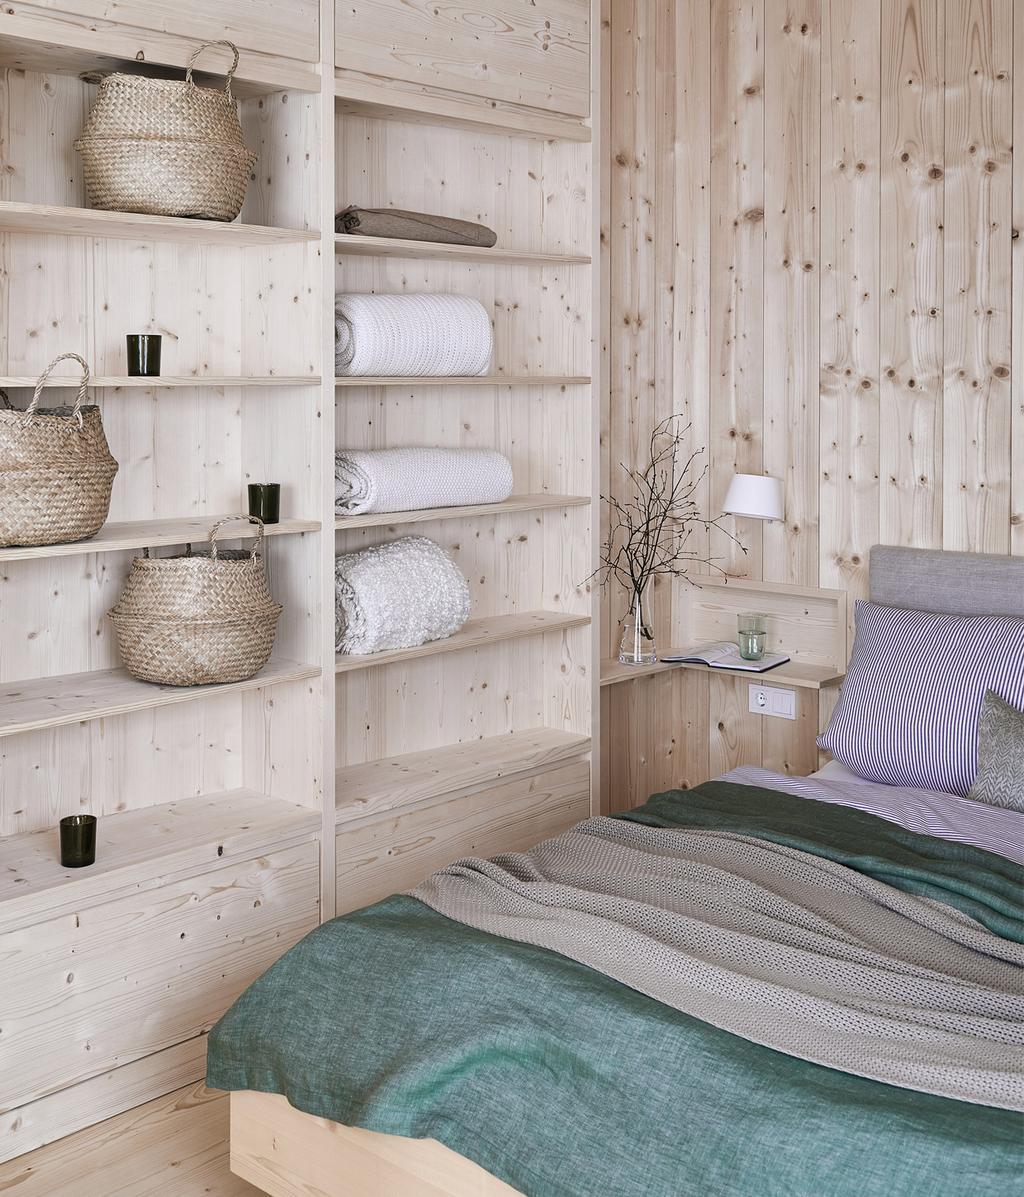 Houten slaapkamer | Tirools | vtwonen 13-2020